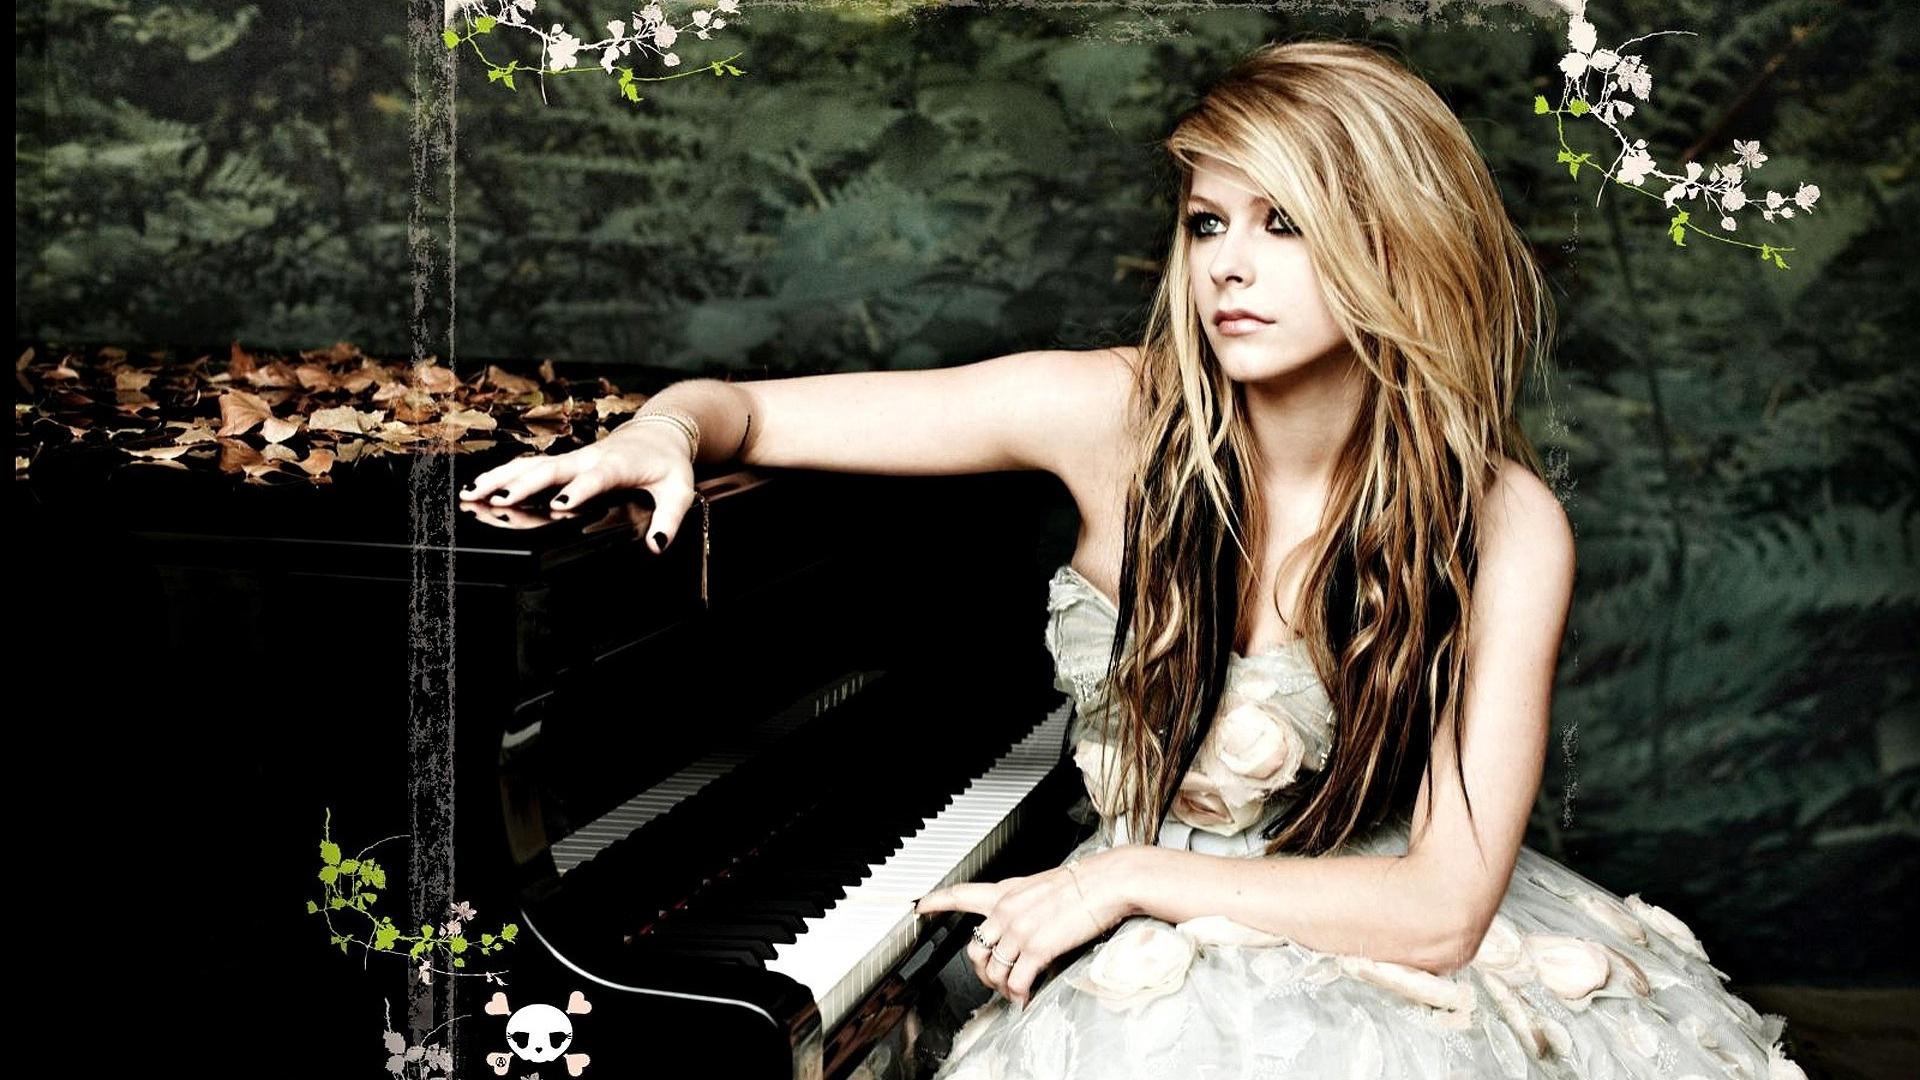 Avril Lavigne Goodbye Lullaby Album Wallpapers - 1920x1080 ...